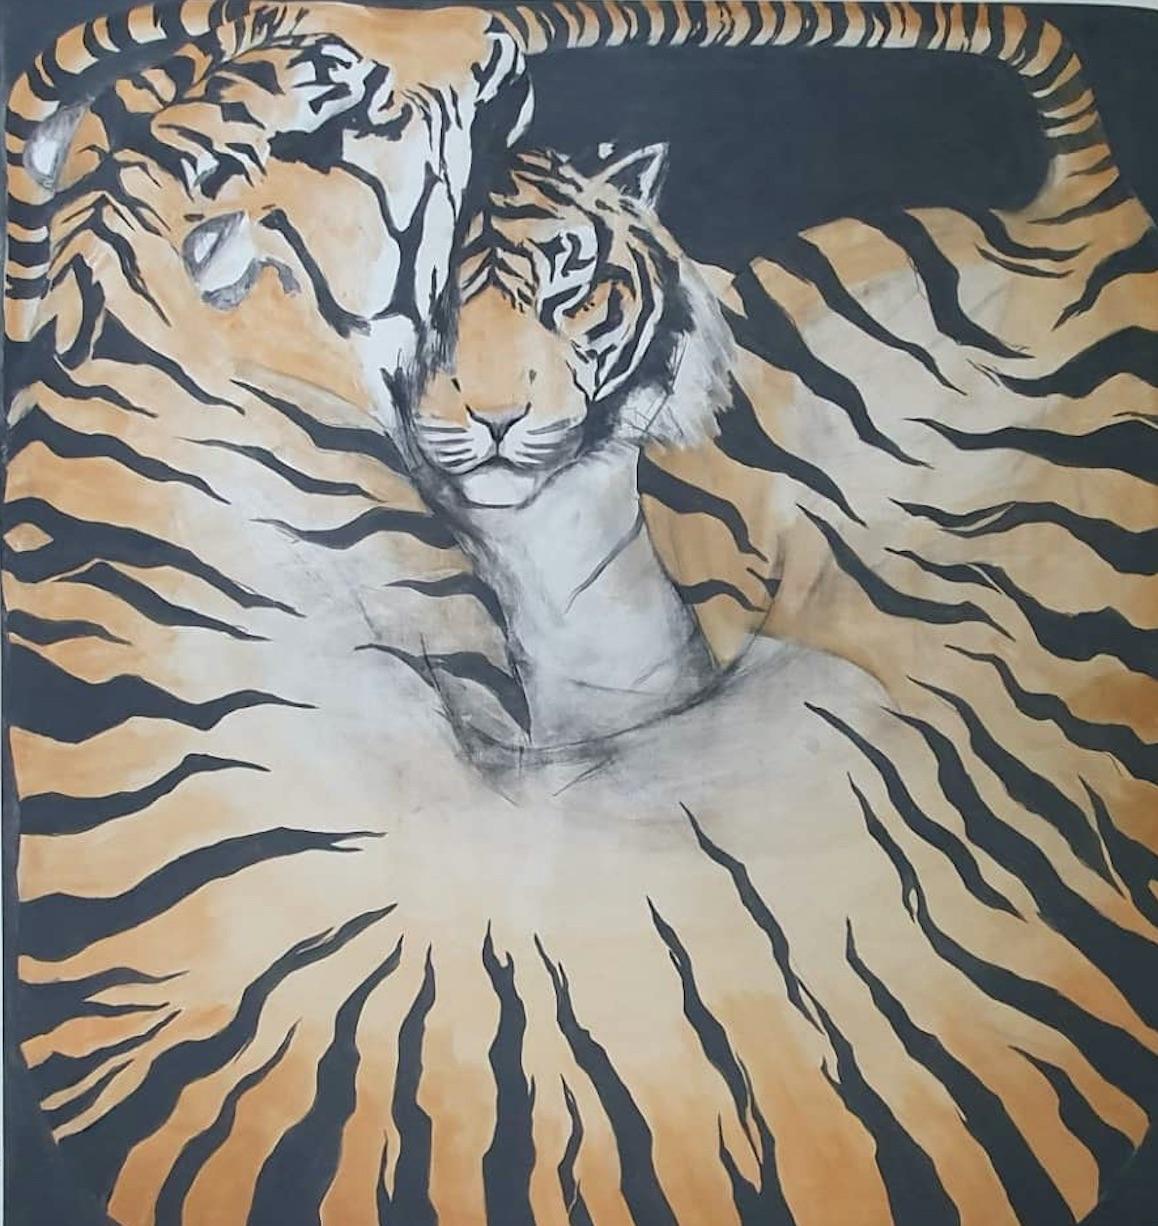 Zimbiri (b. 1991) Boxed Love, 2020 Saa-tshen on Rhay-shing (Earth paint on canvas) Signed 176.5 x 165.7 cm 69 1/2 x 65 1/4 in